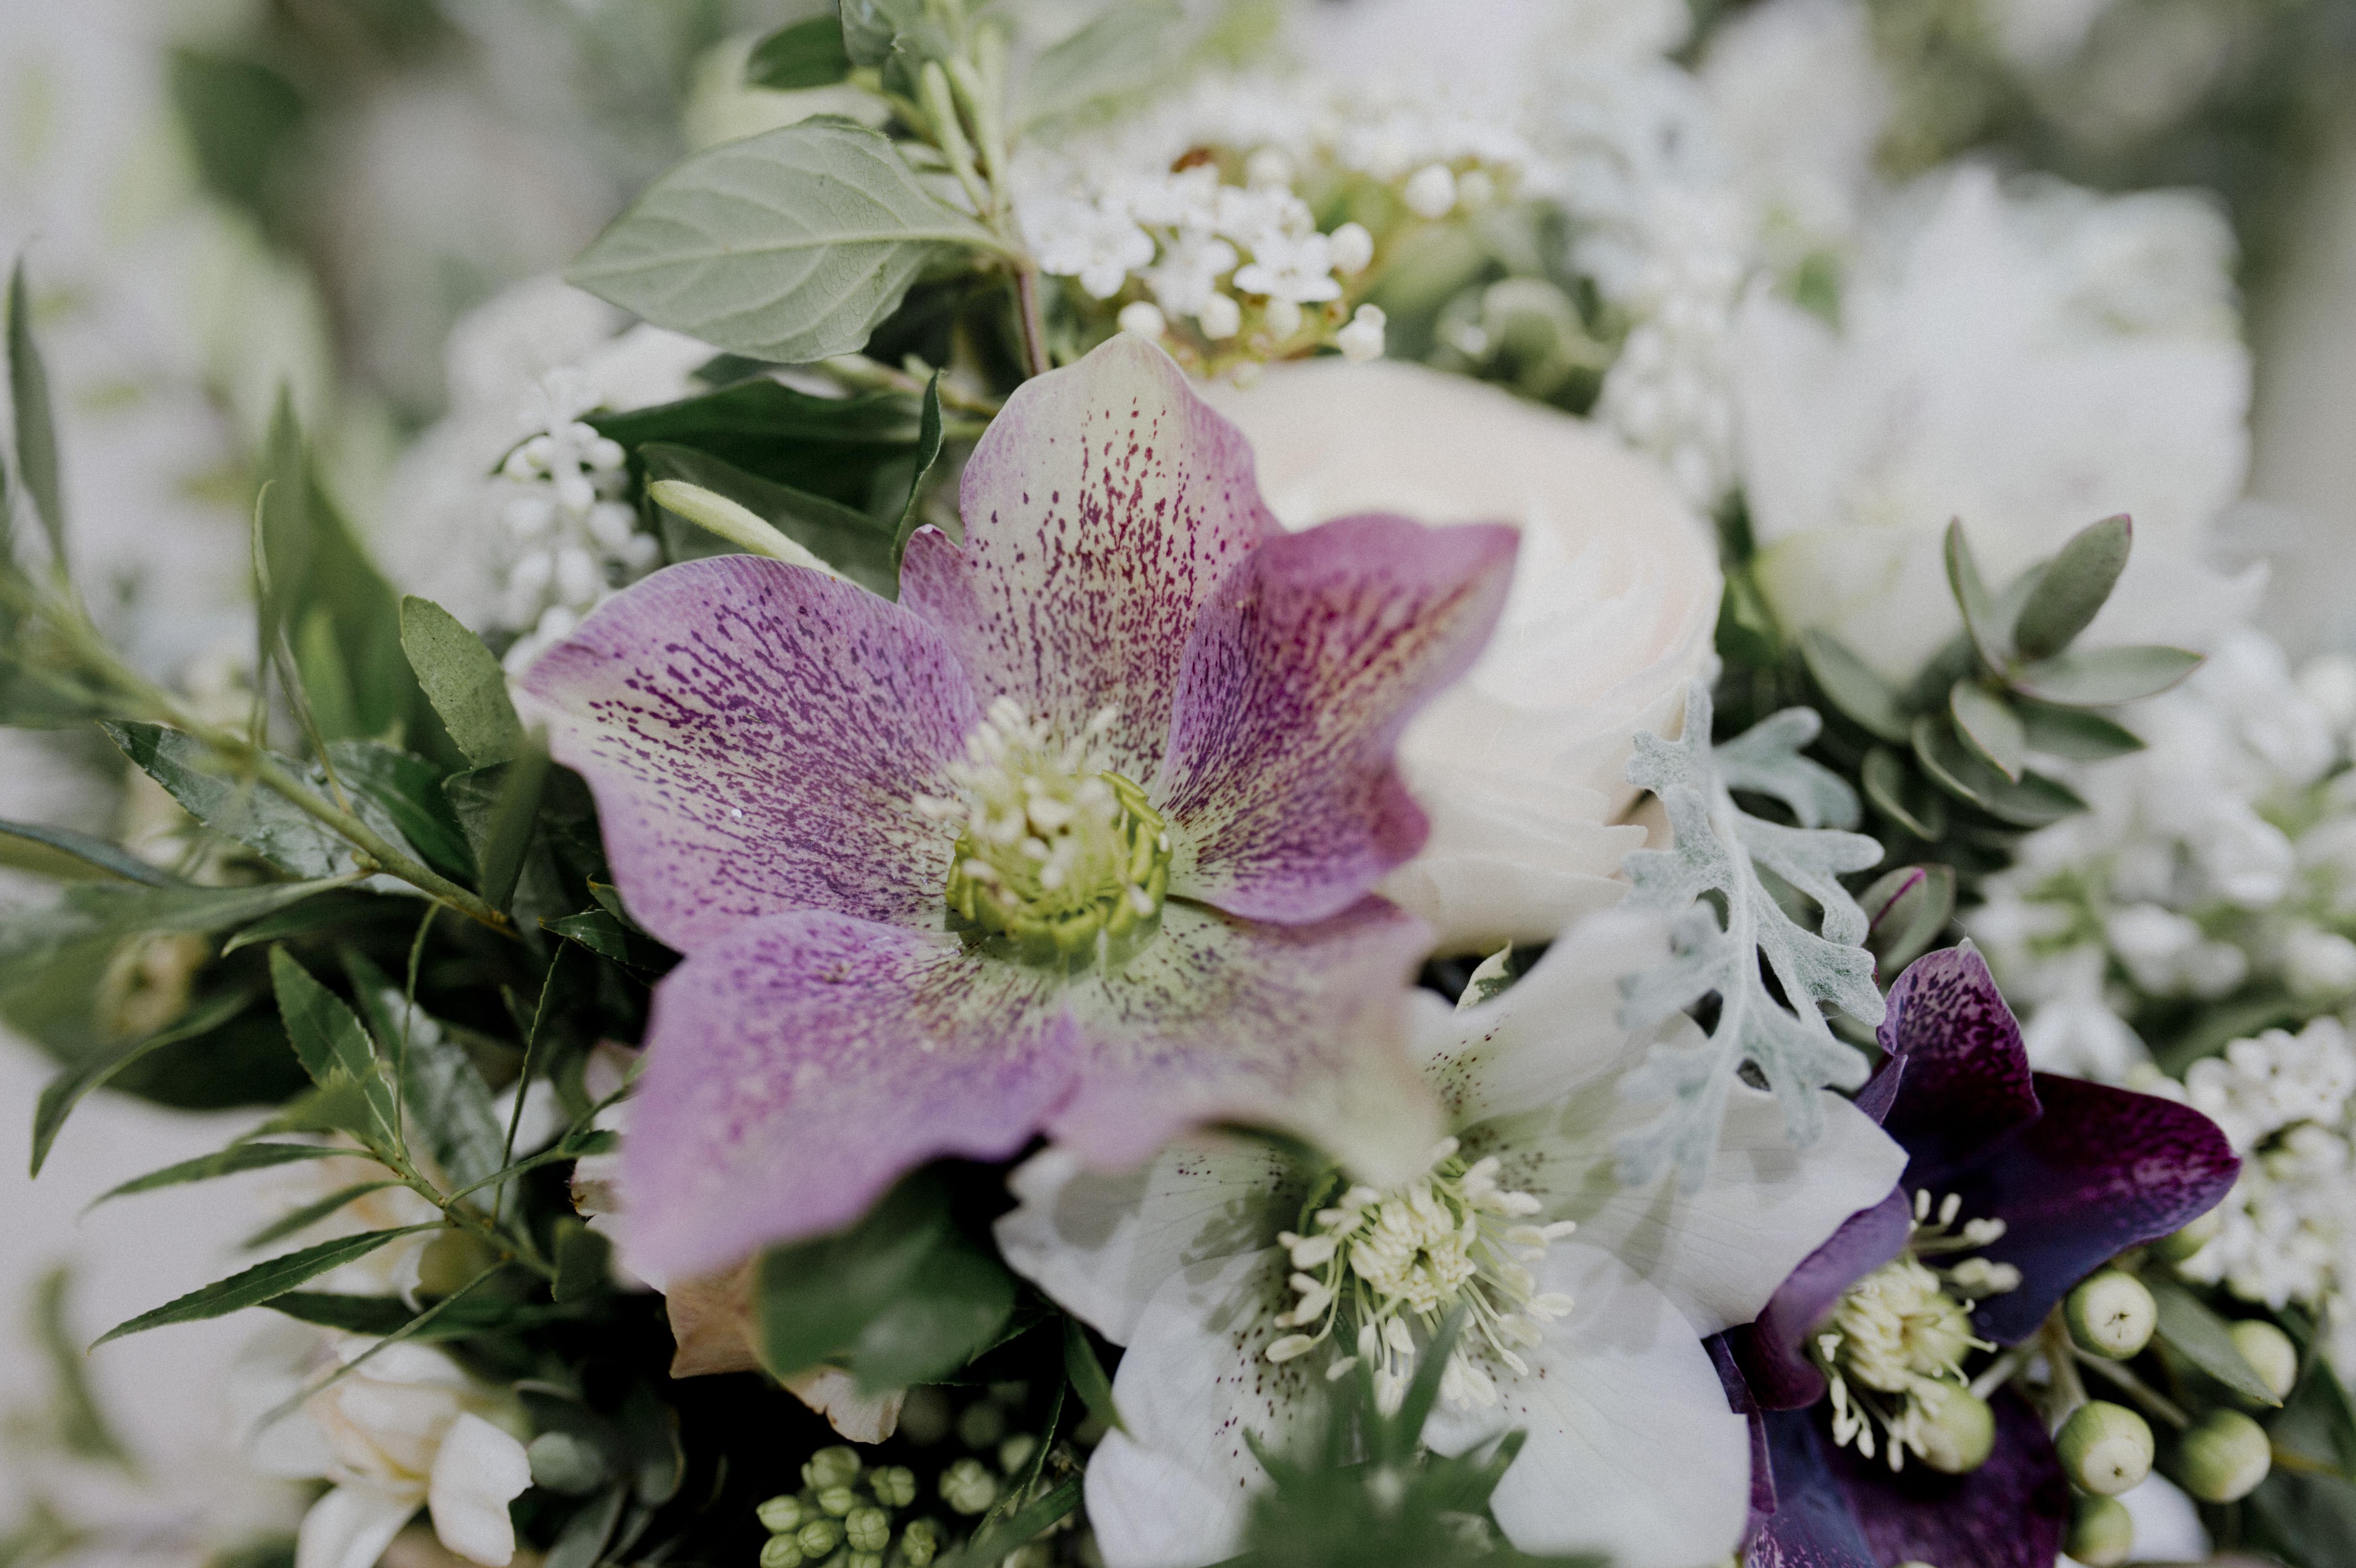 solveigetronanphotographesloveectteagardenflowers_10.JPG